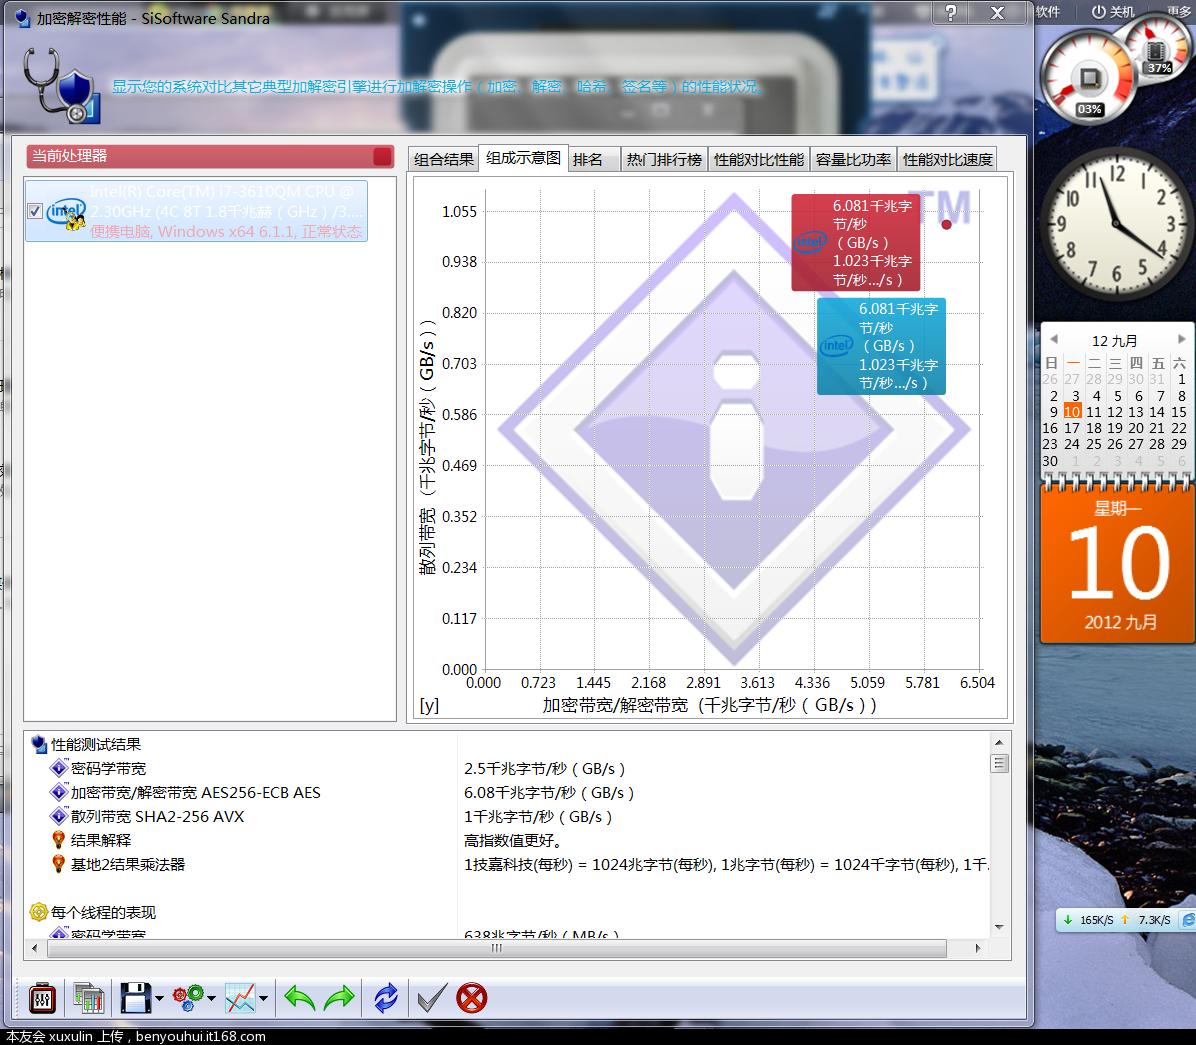 Sisoftware Sandra 截图16.PNG